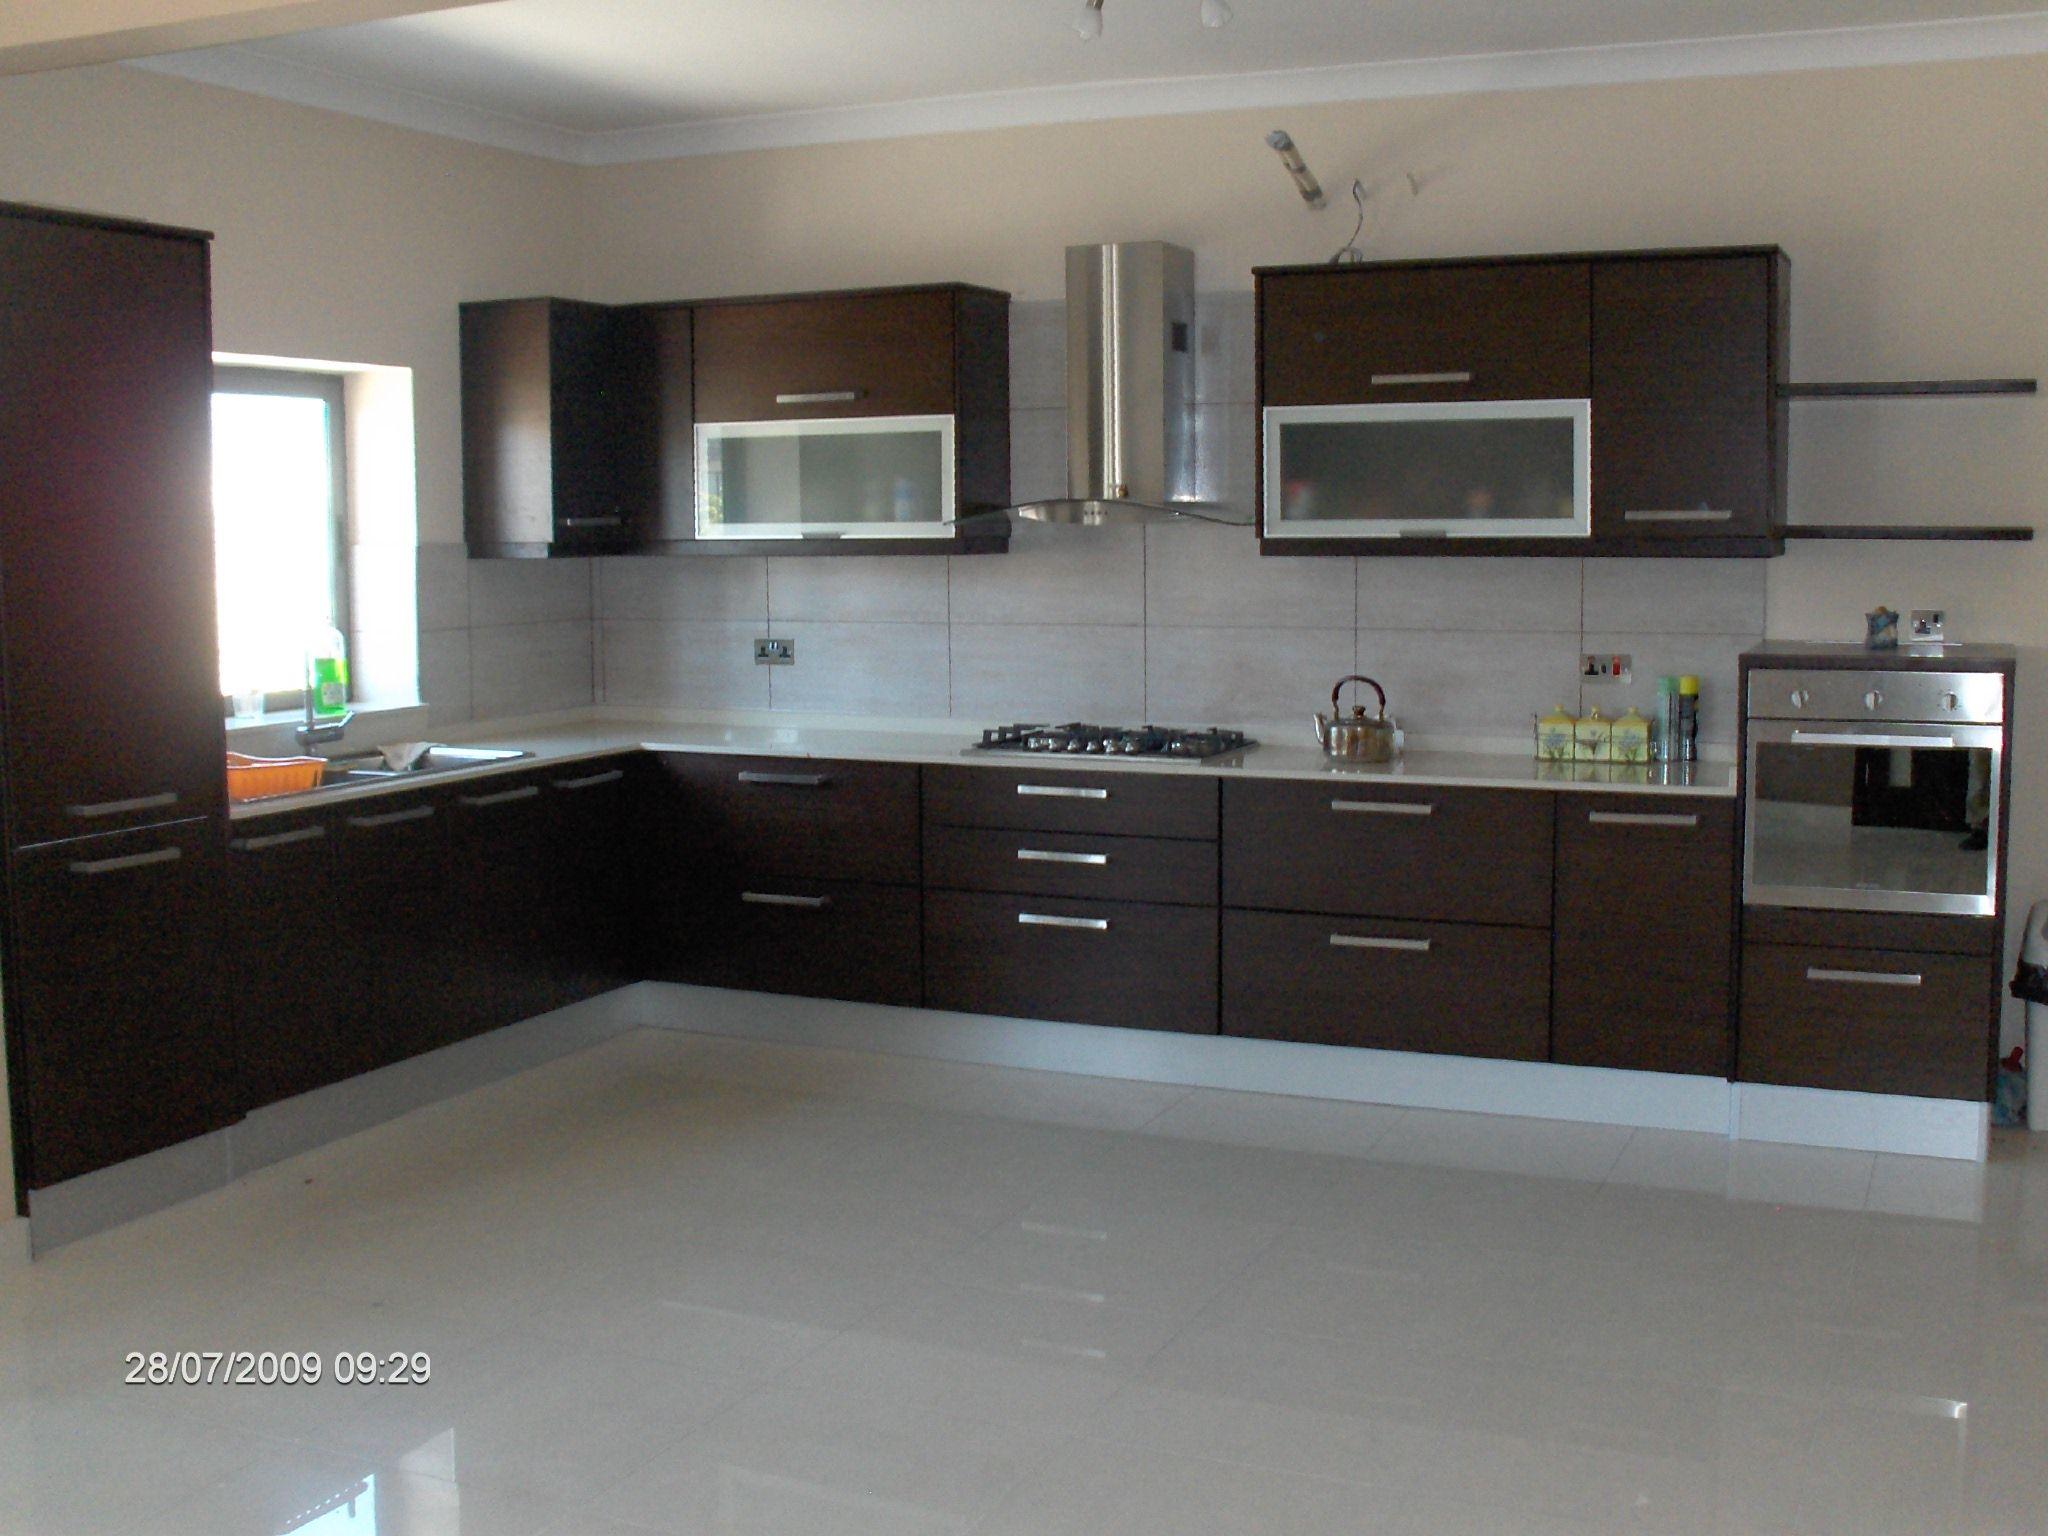 modern kitchens | modern kitchen in wenge including appliances